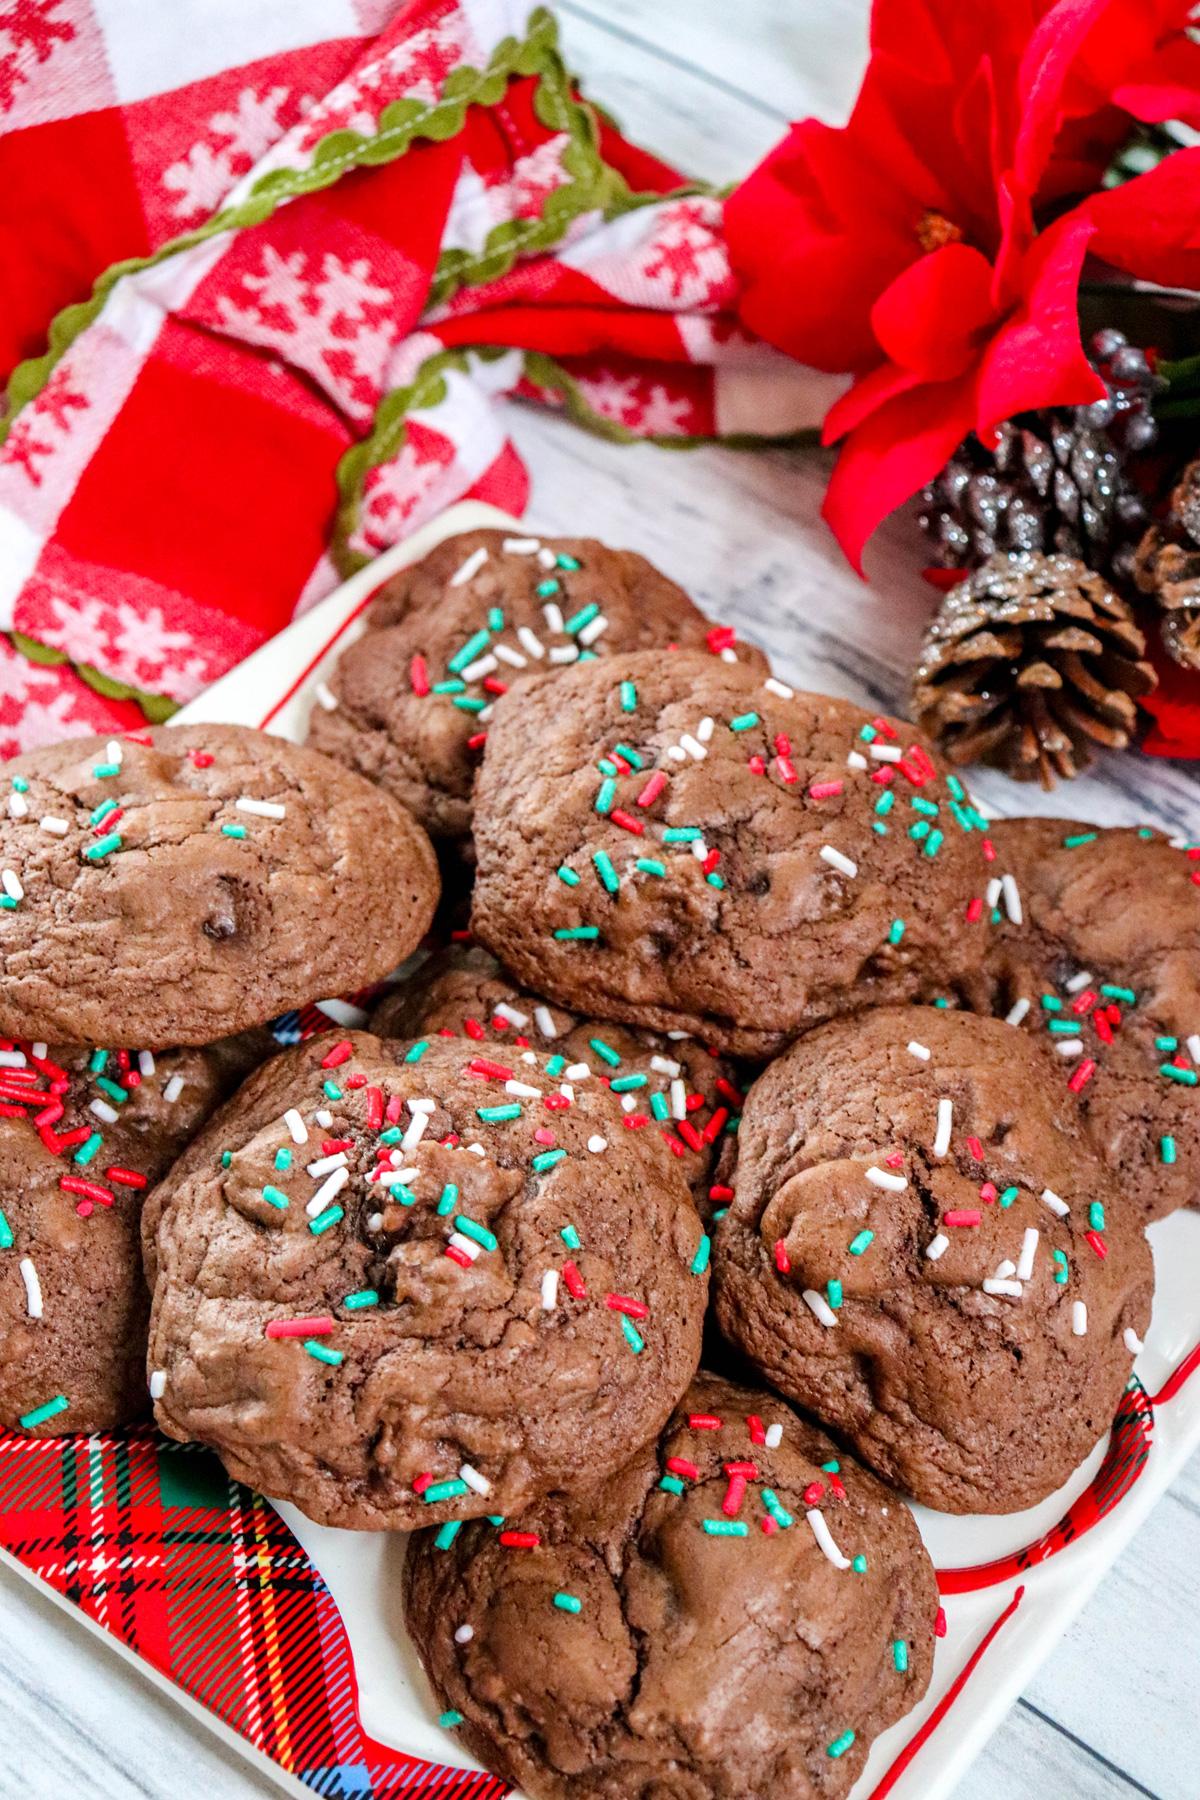 Kahlua Mudslide Cookies